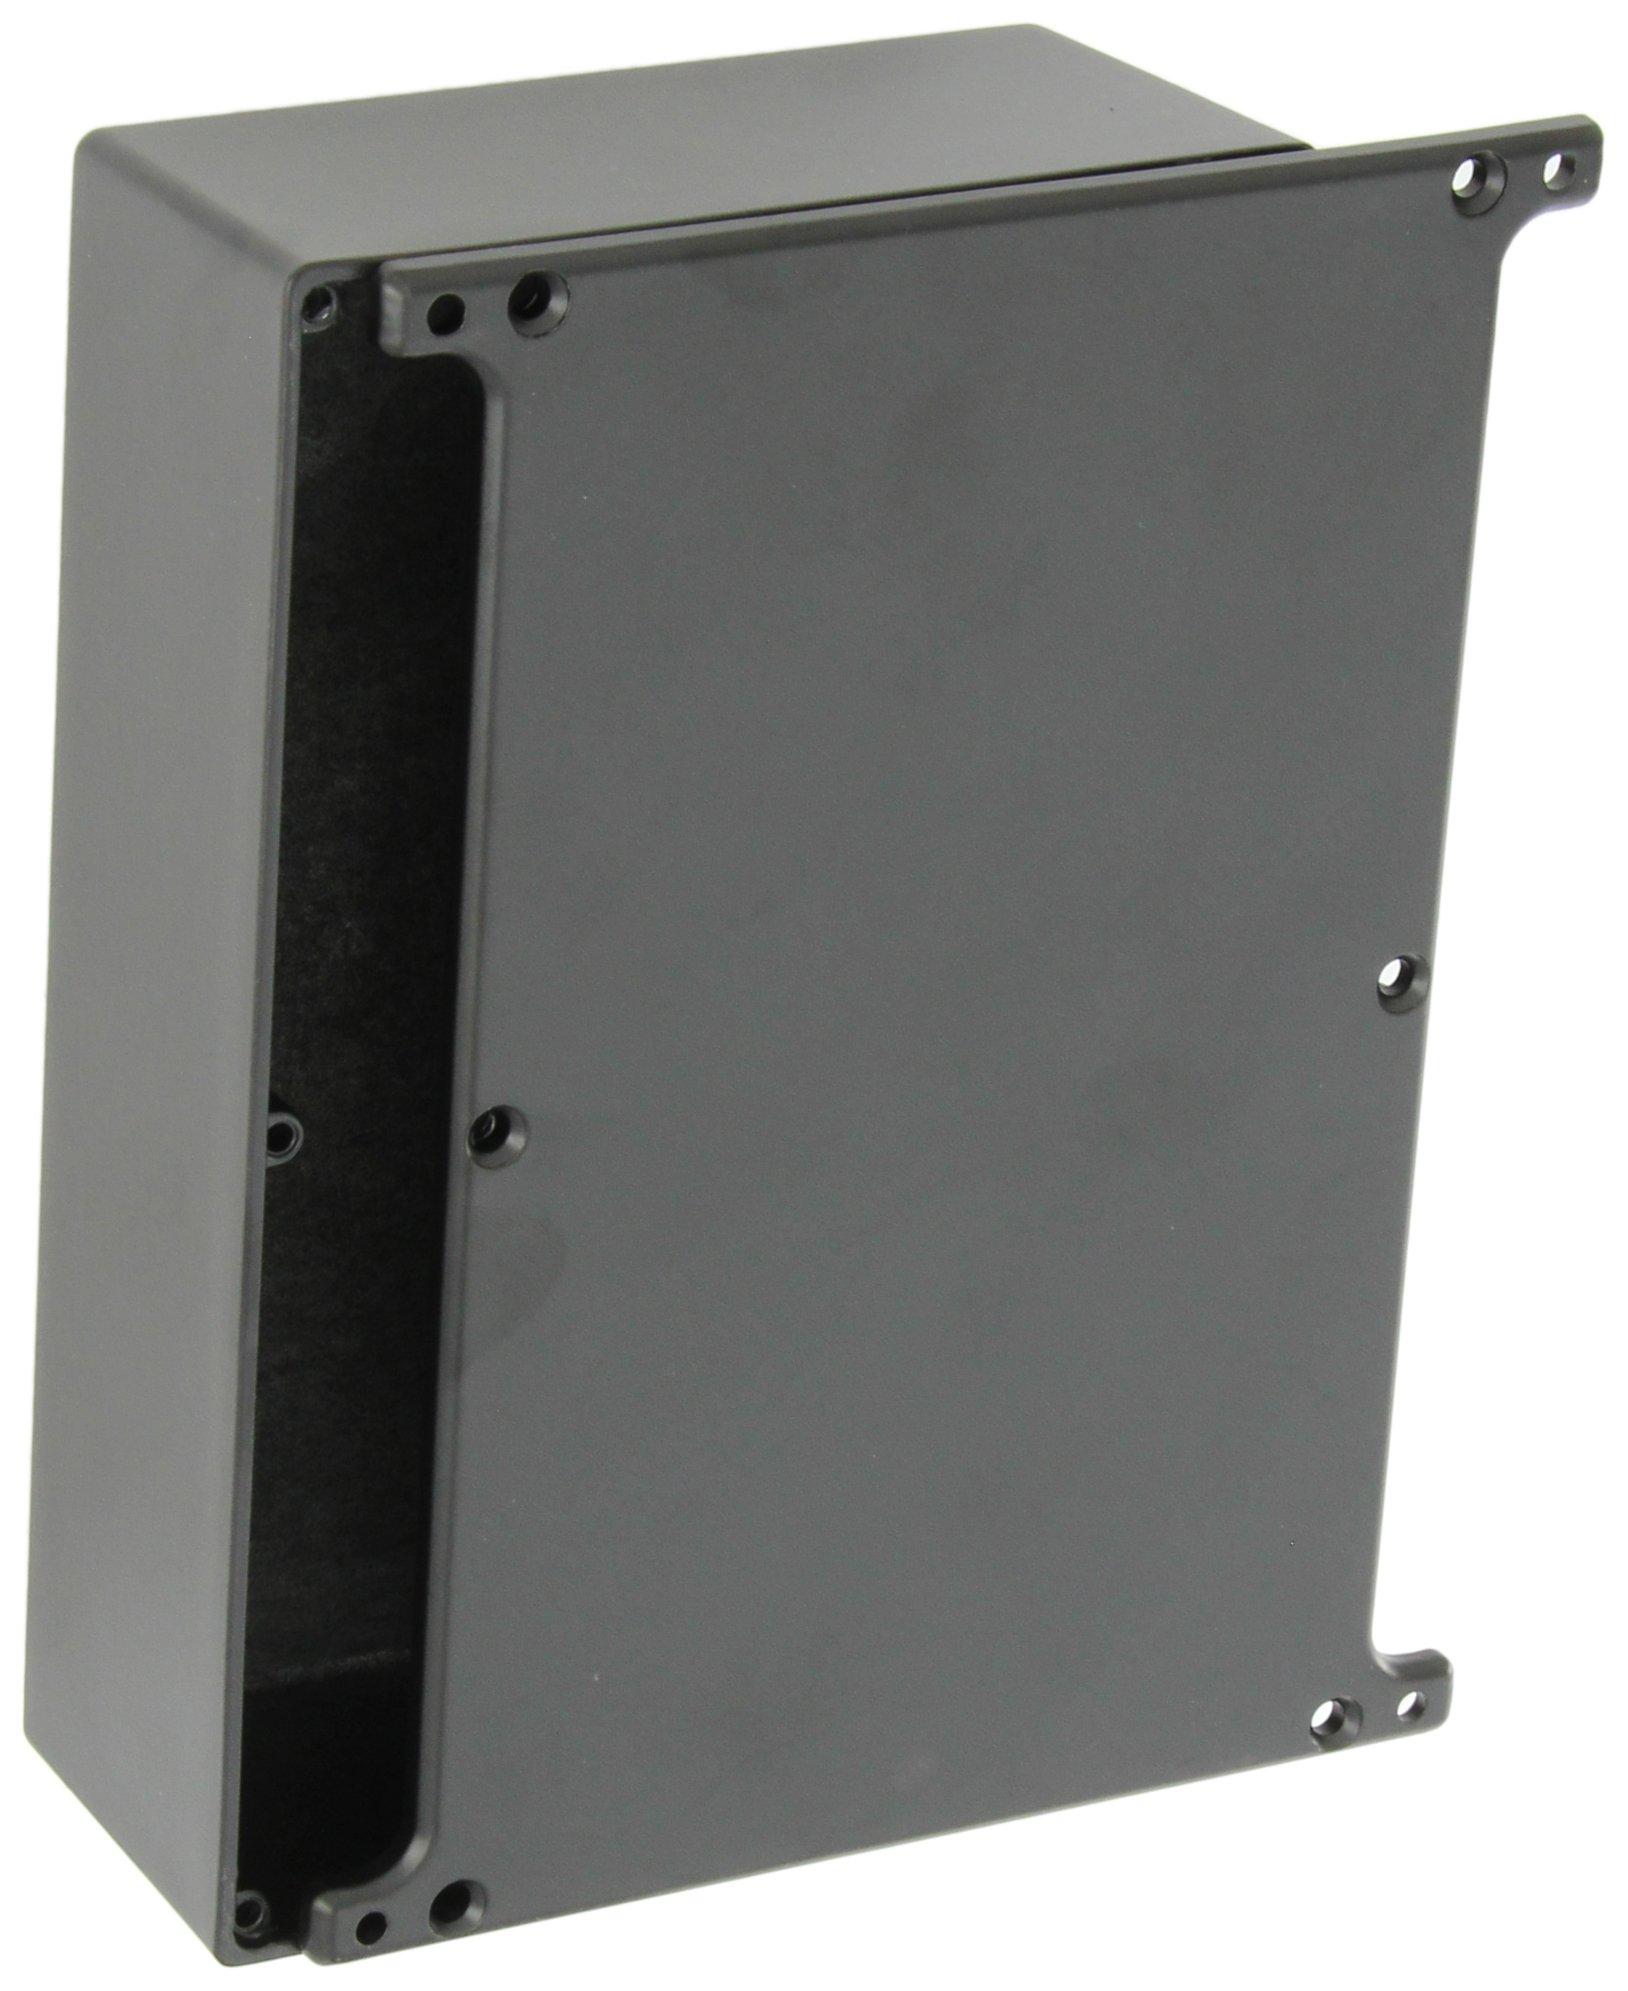 BUD Industries CU-5247-B Die Cast Aluminum Econobox with Mounting Bracket Cover, 7-3/8'' Length x 4-11/16'' Width x 2-13/64'' Height, Black Powdercoat Finish